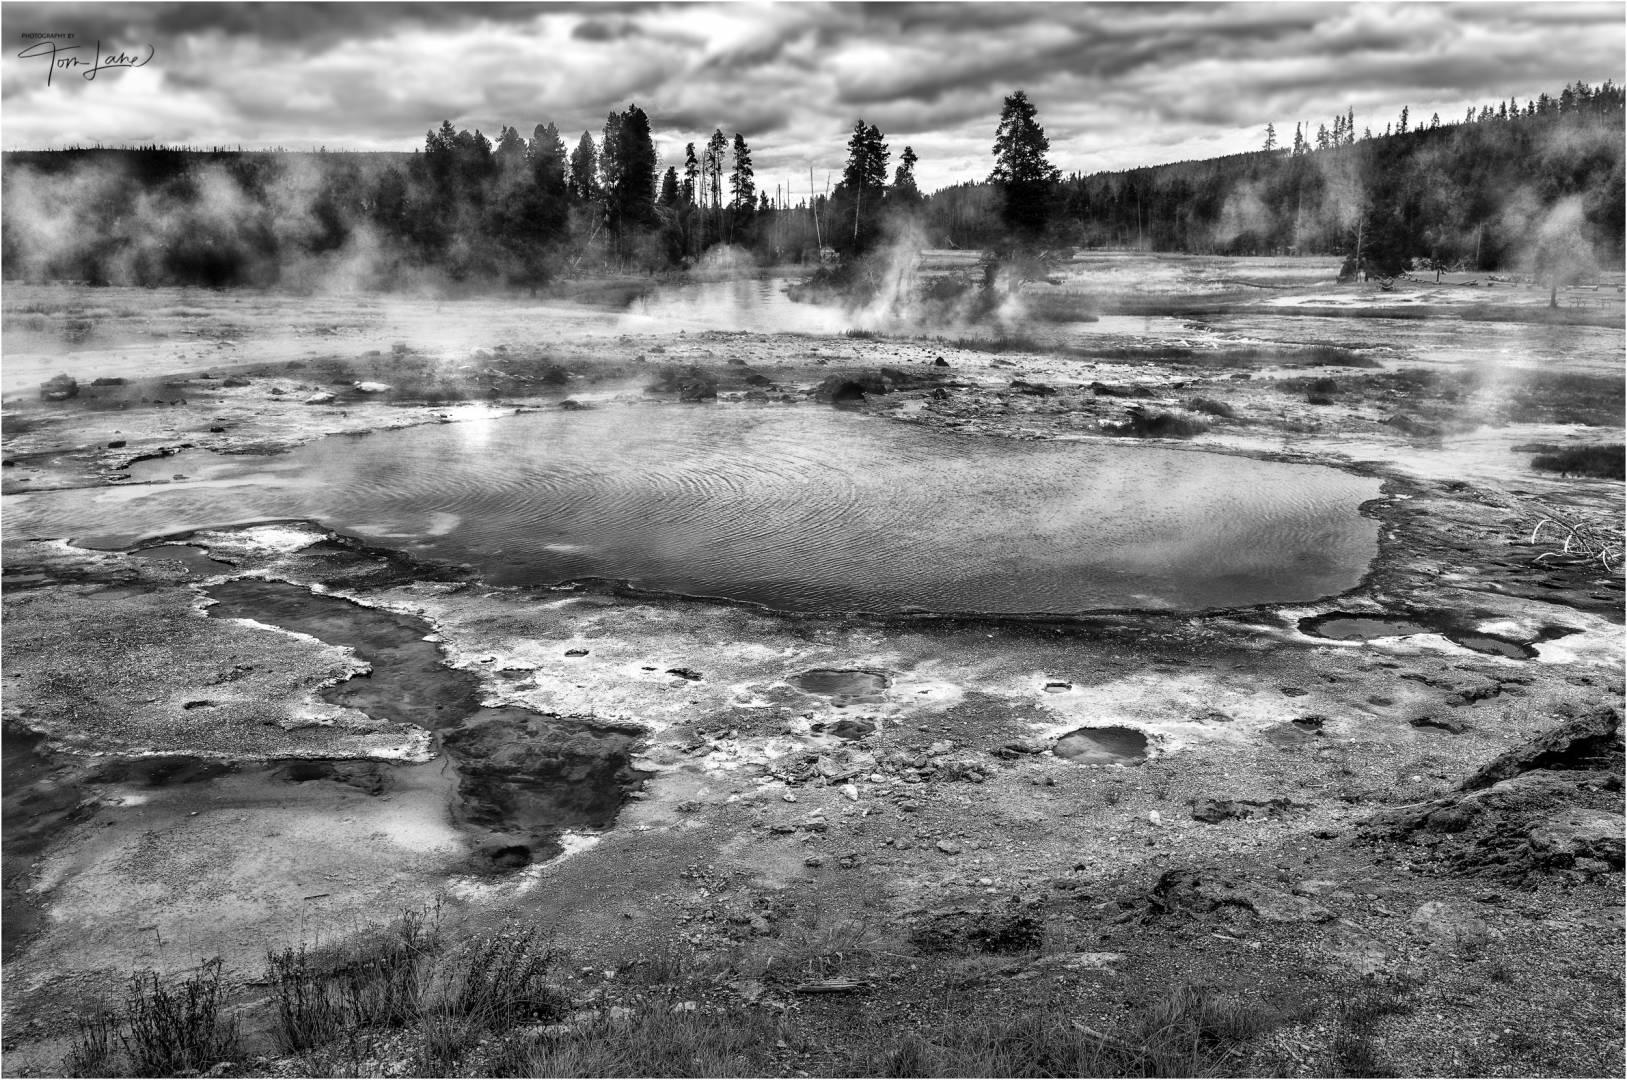 Yellowstone National Park, USA (Leica SL with Vario Elmarit 24-90mm)